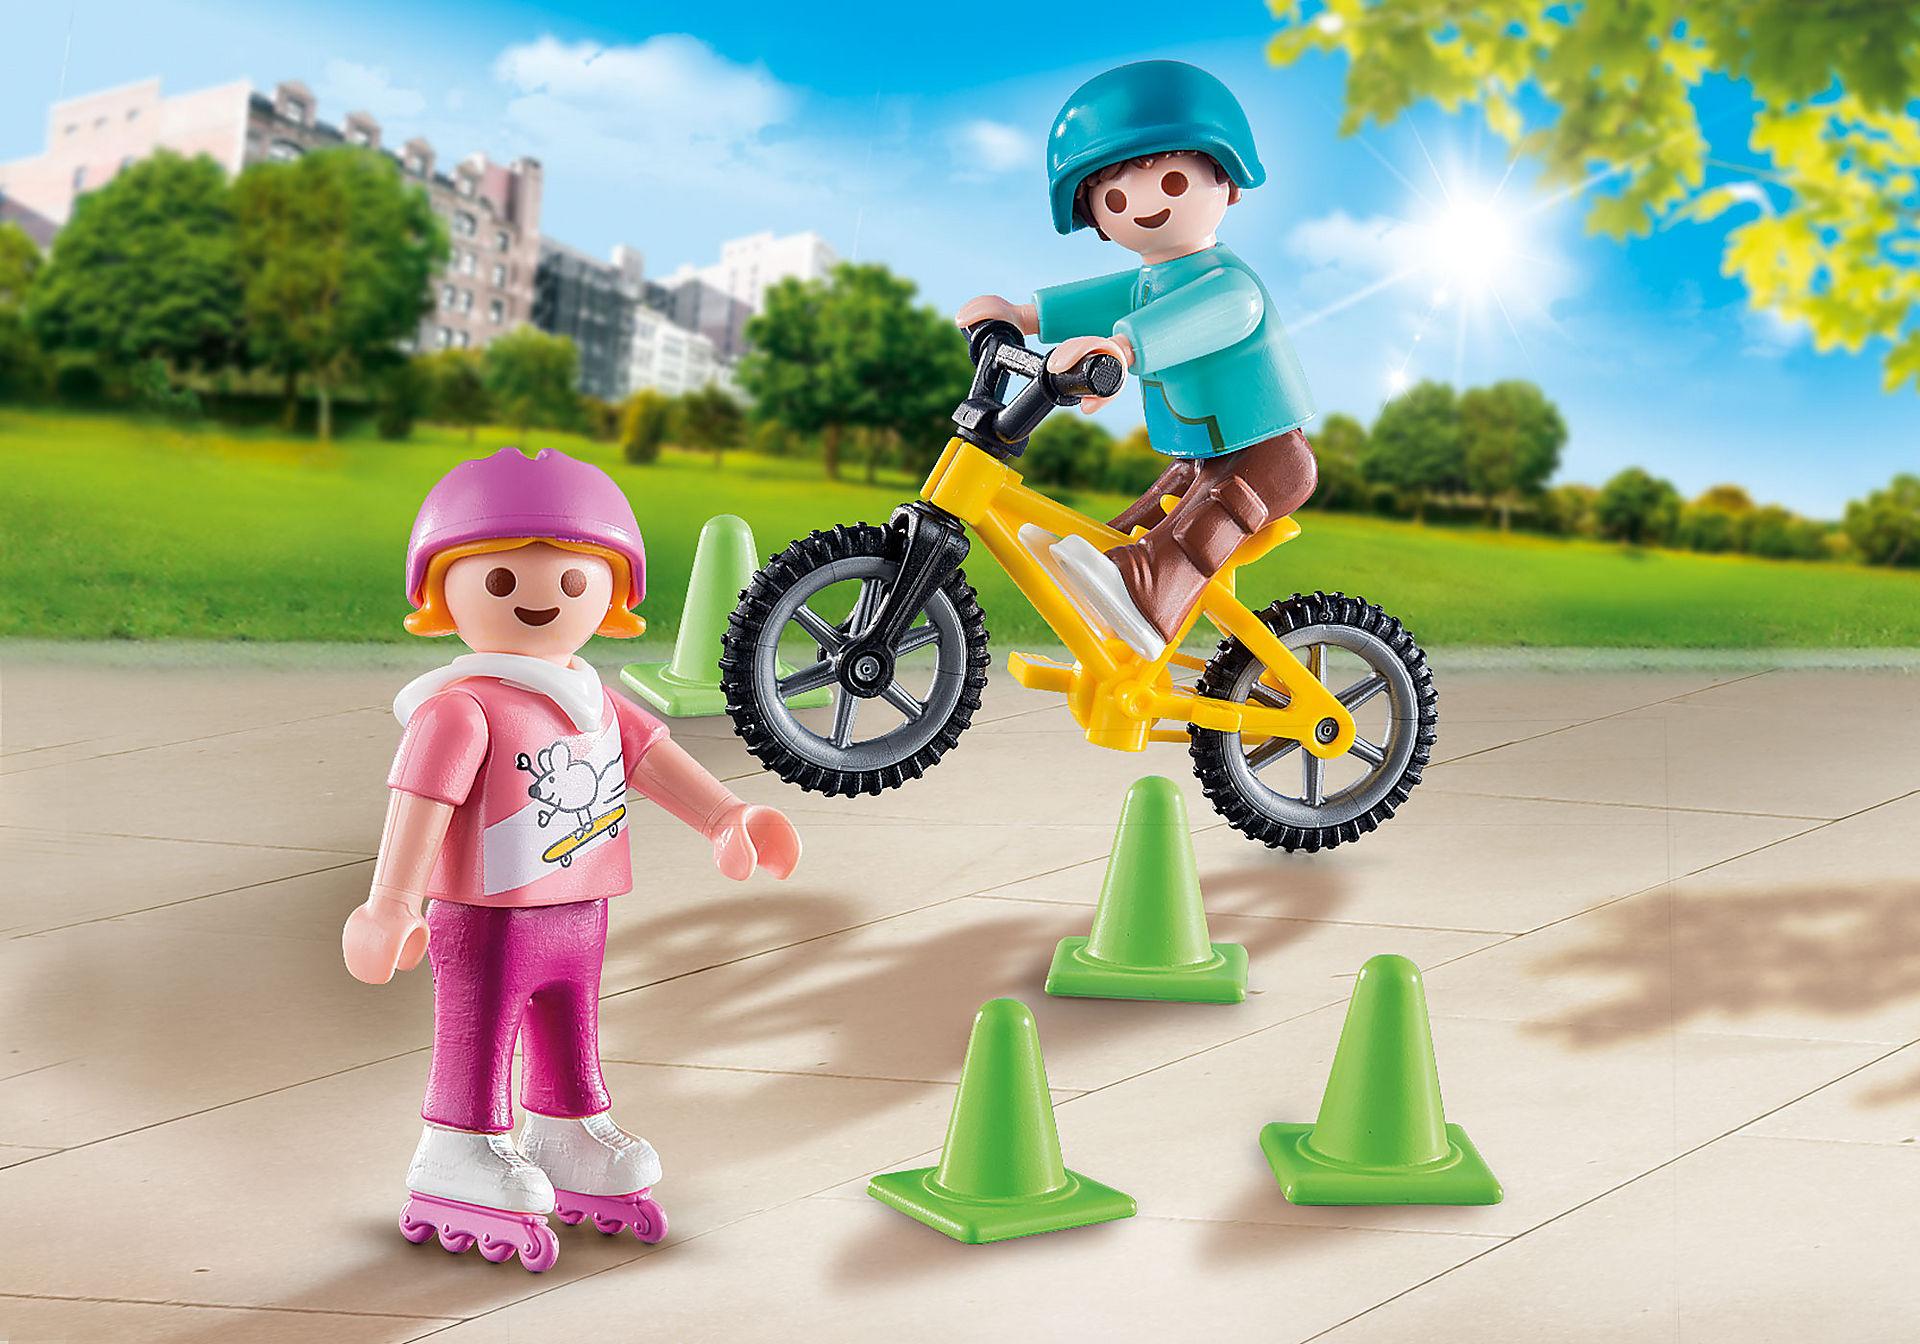 http://media.playmobil.com/i/playmobil/70061_product_detail/Kinder mit Skates und BMX